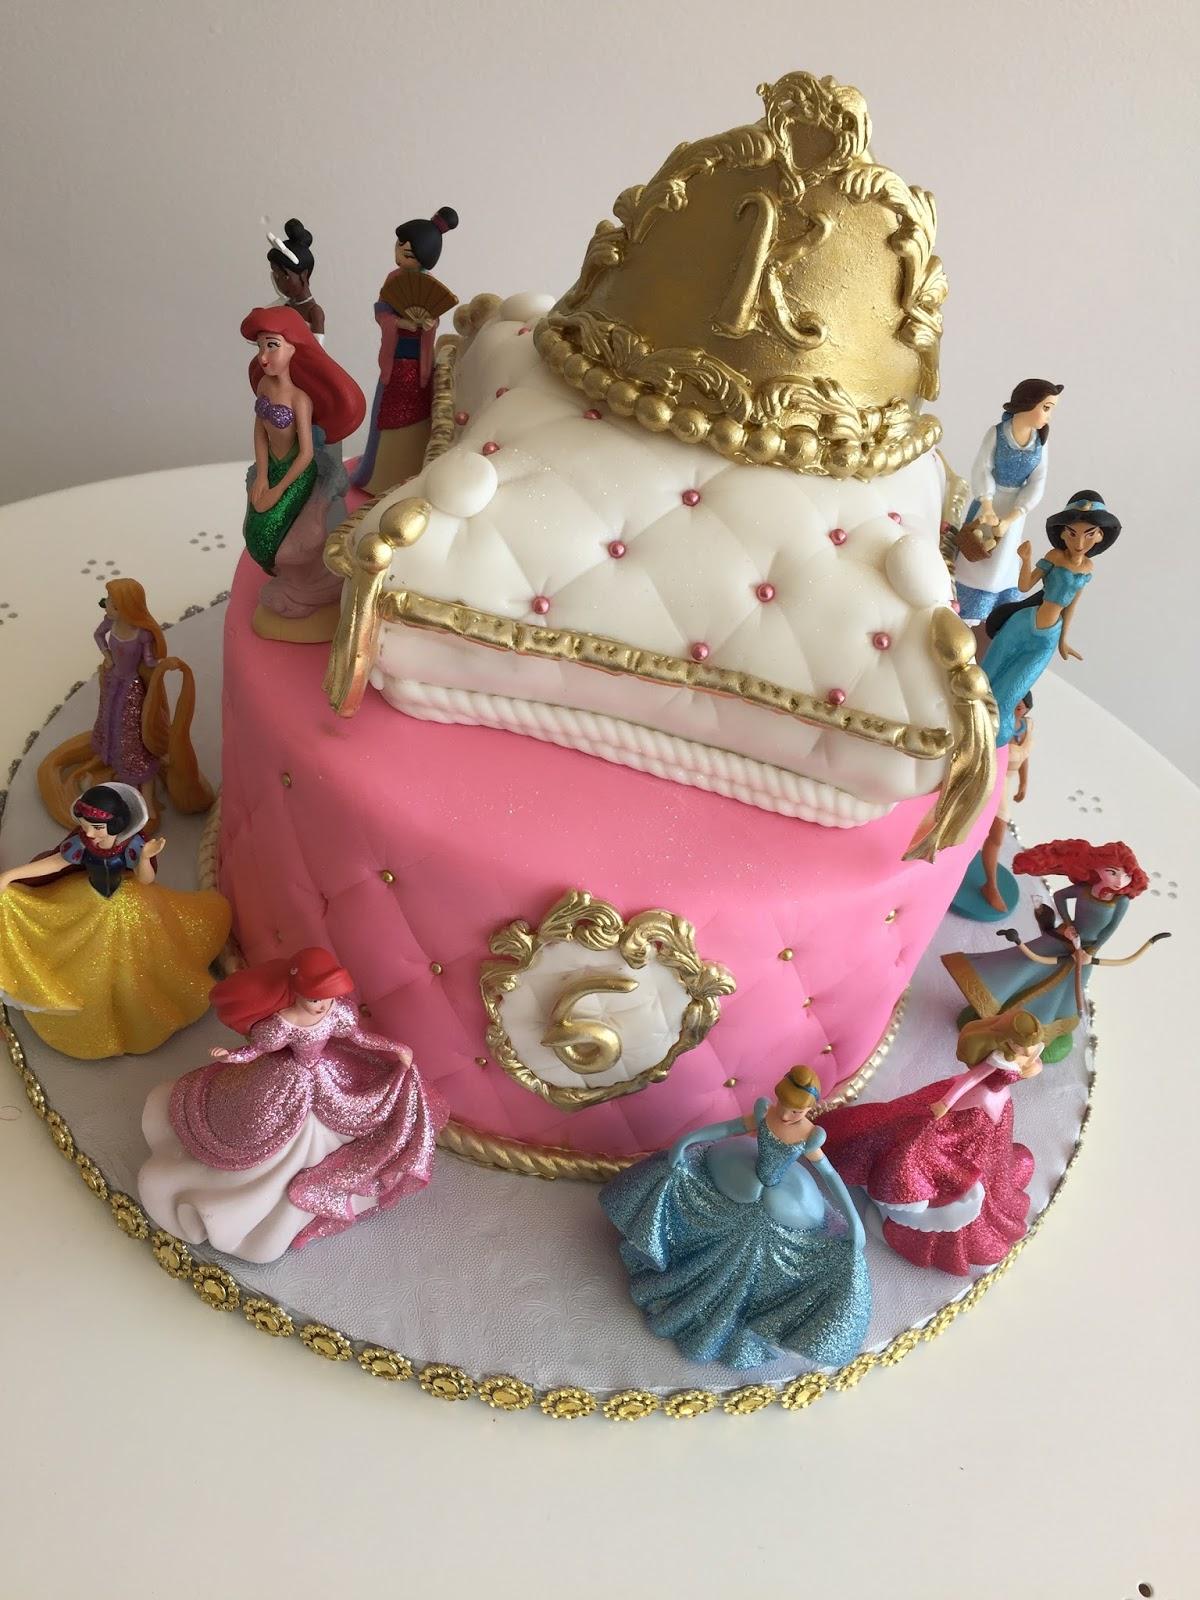 Tremendous Baking With Roxanas Cakes Princess Themed Birthday Cake Funny Birthday Cards Online Inifofree Goldxyz